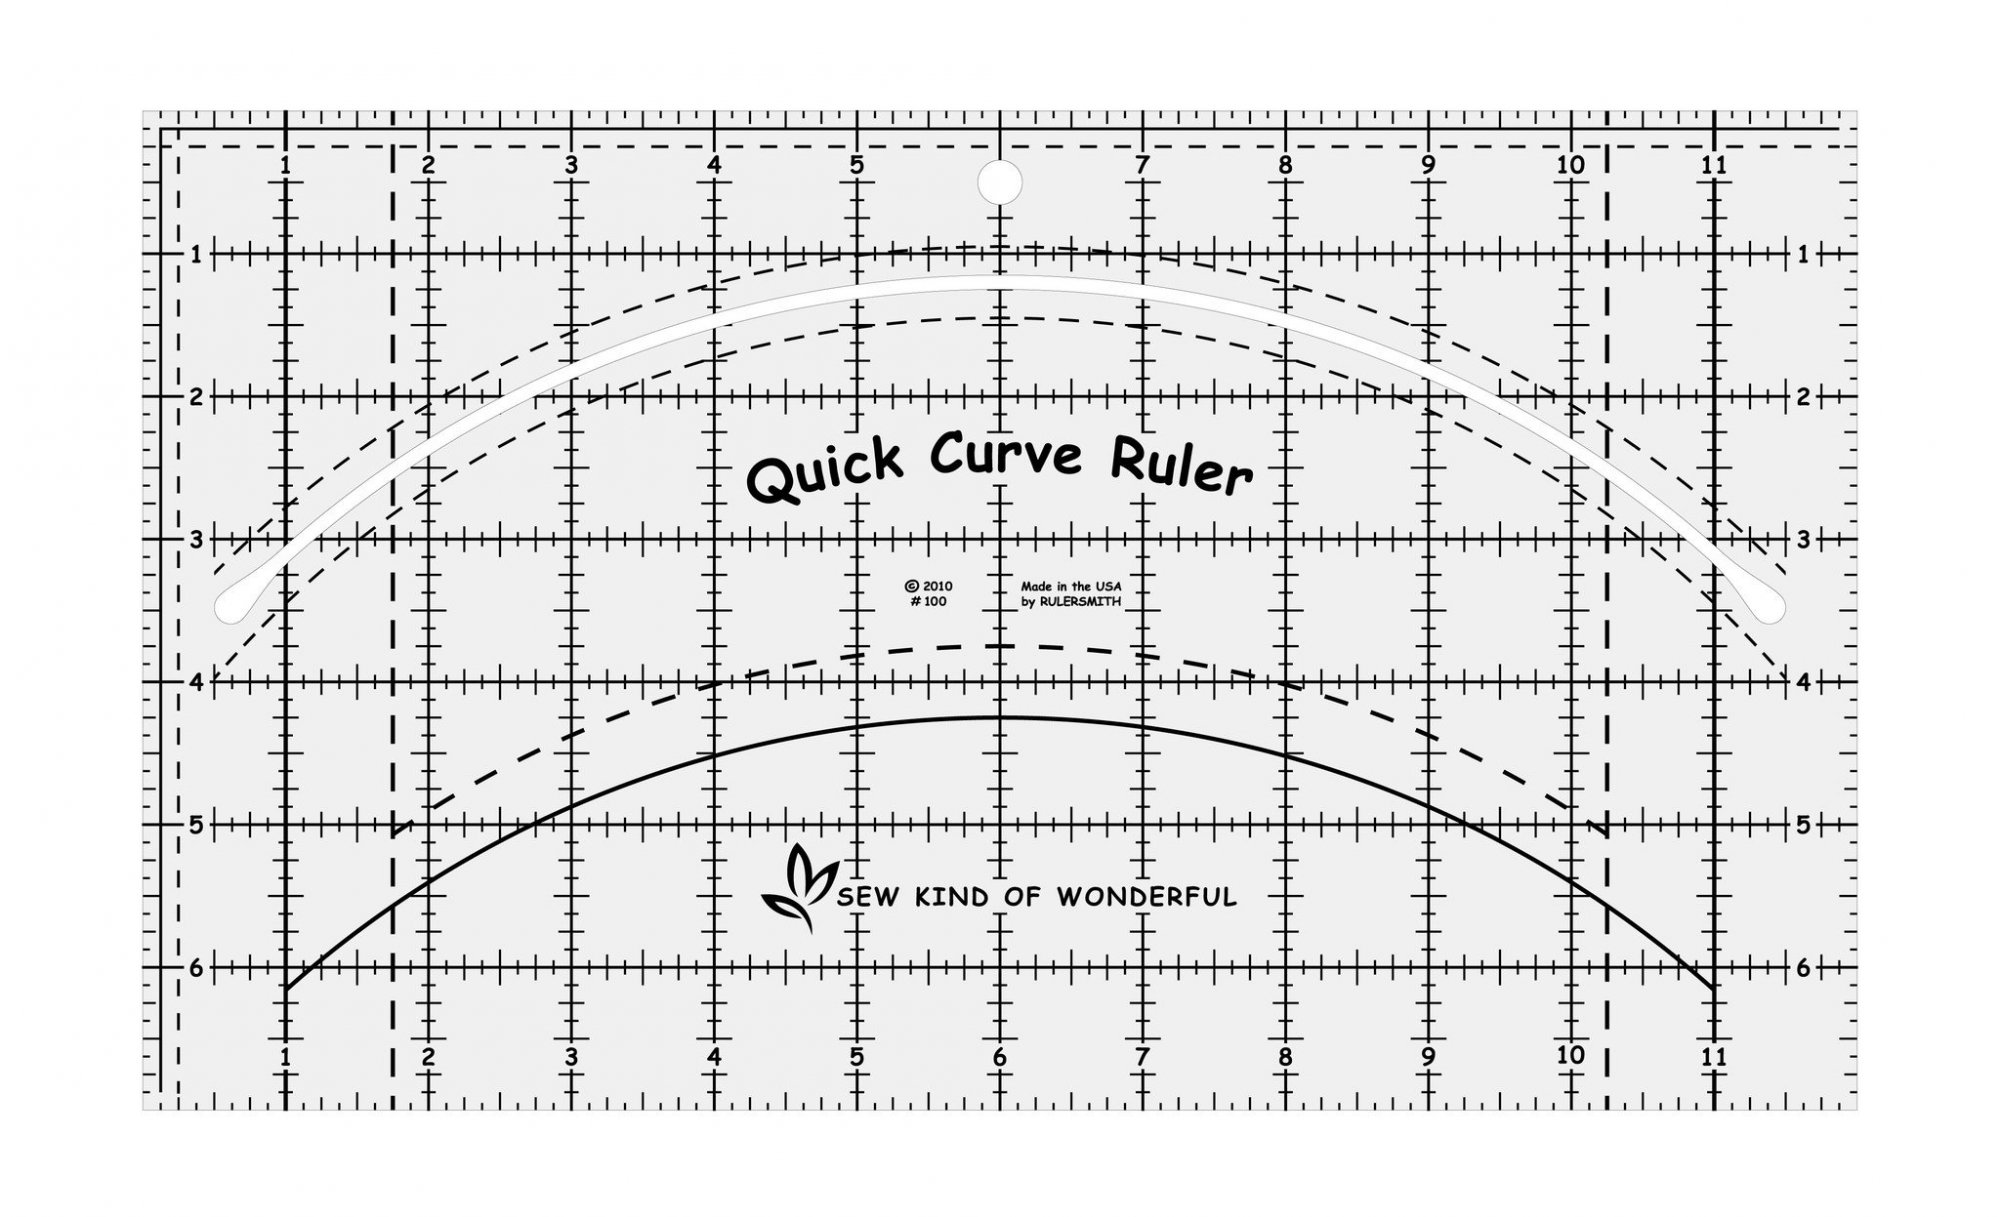 Quick Curve Ruler Sew Kind of Wonderful